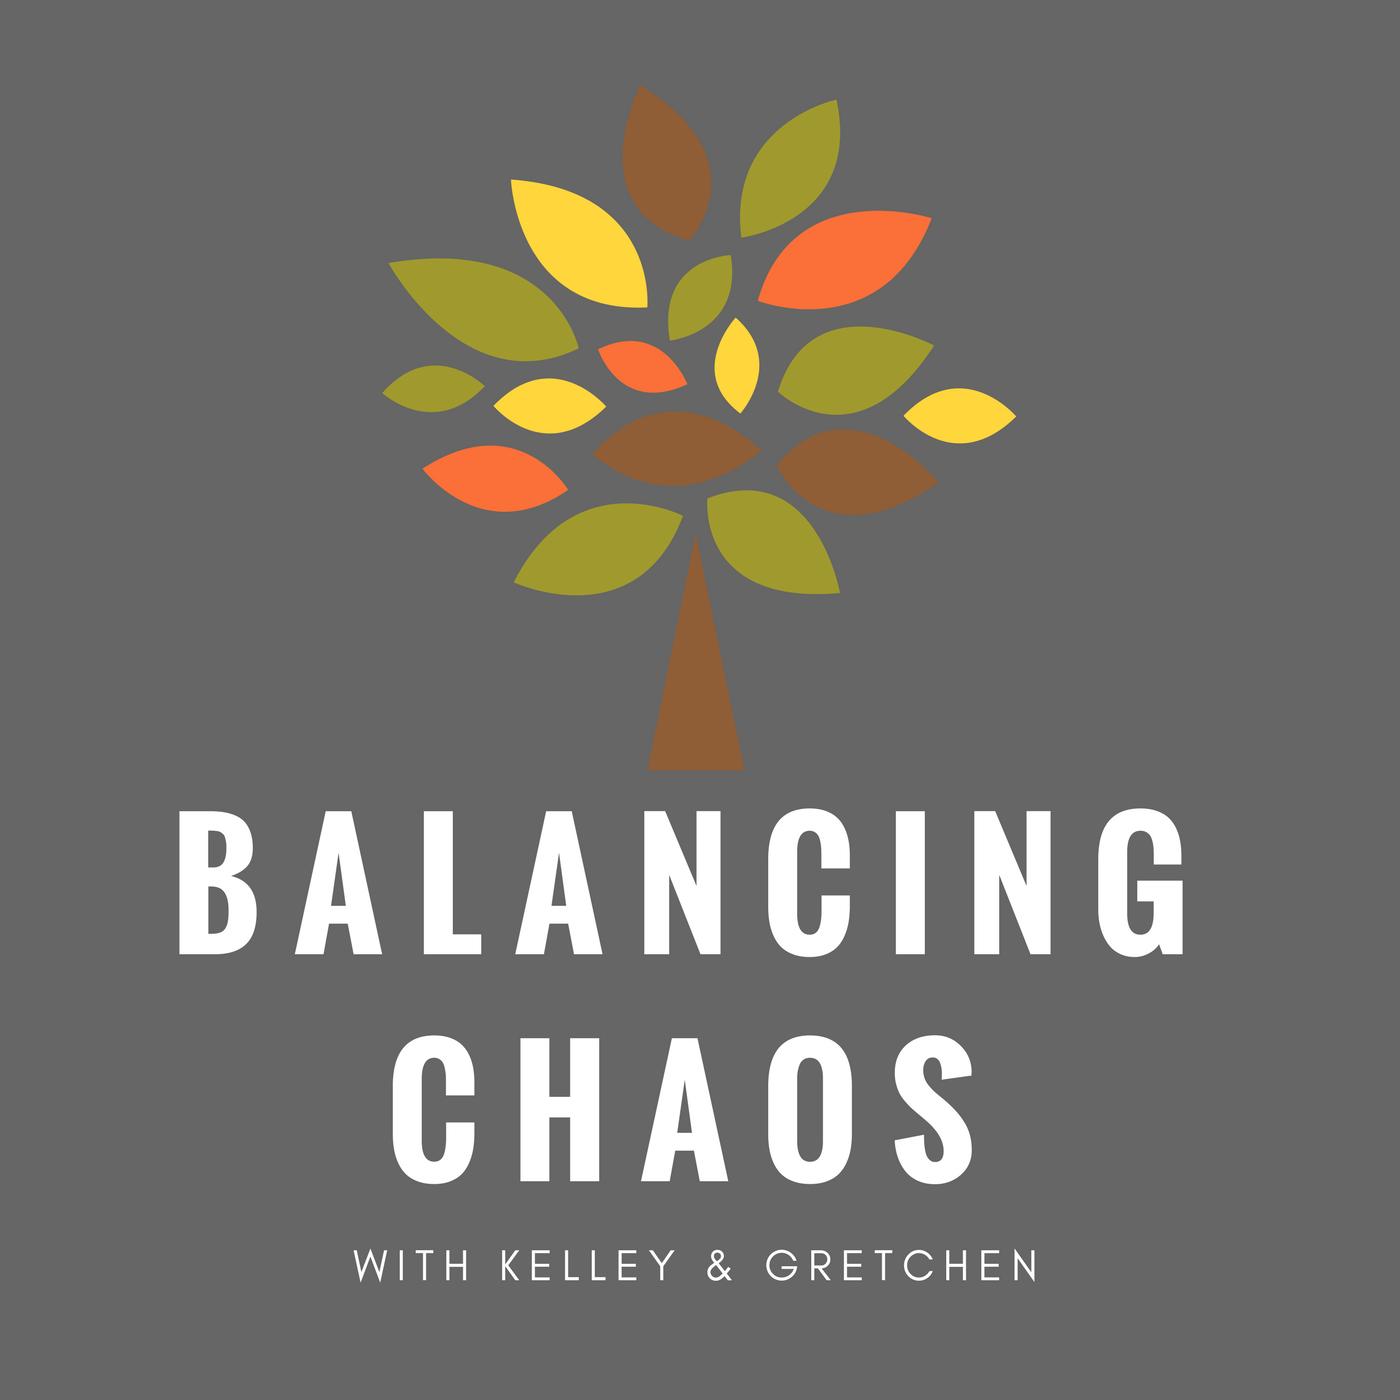 Delightful Balancing Chaos